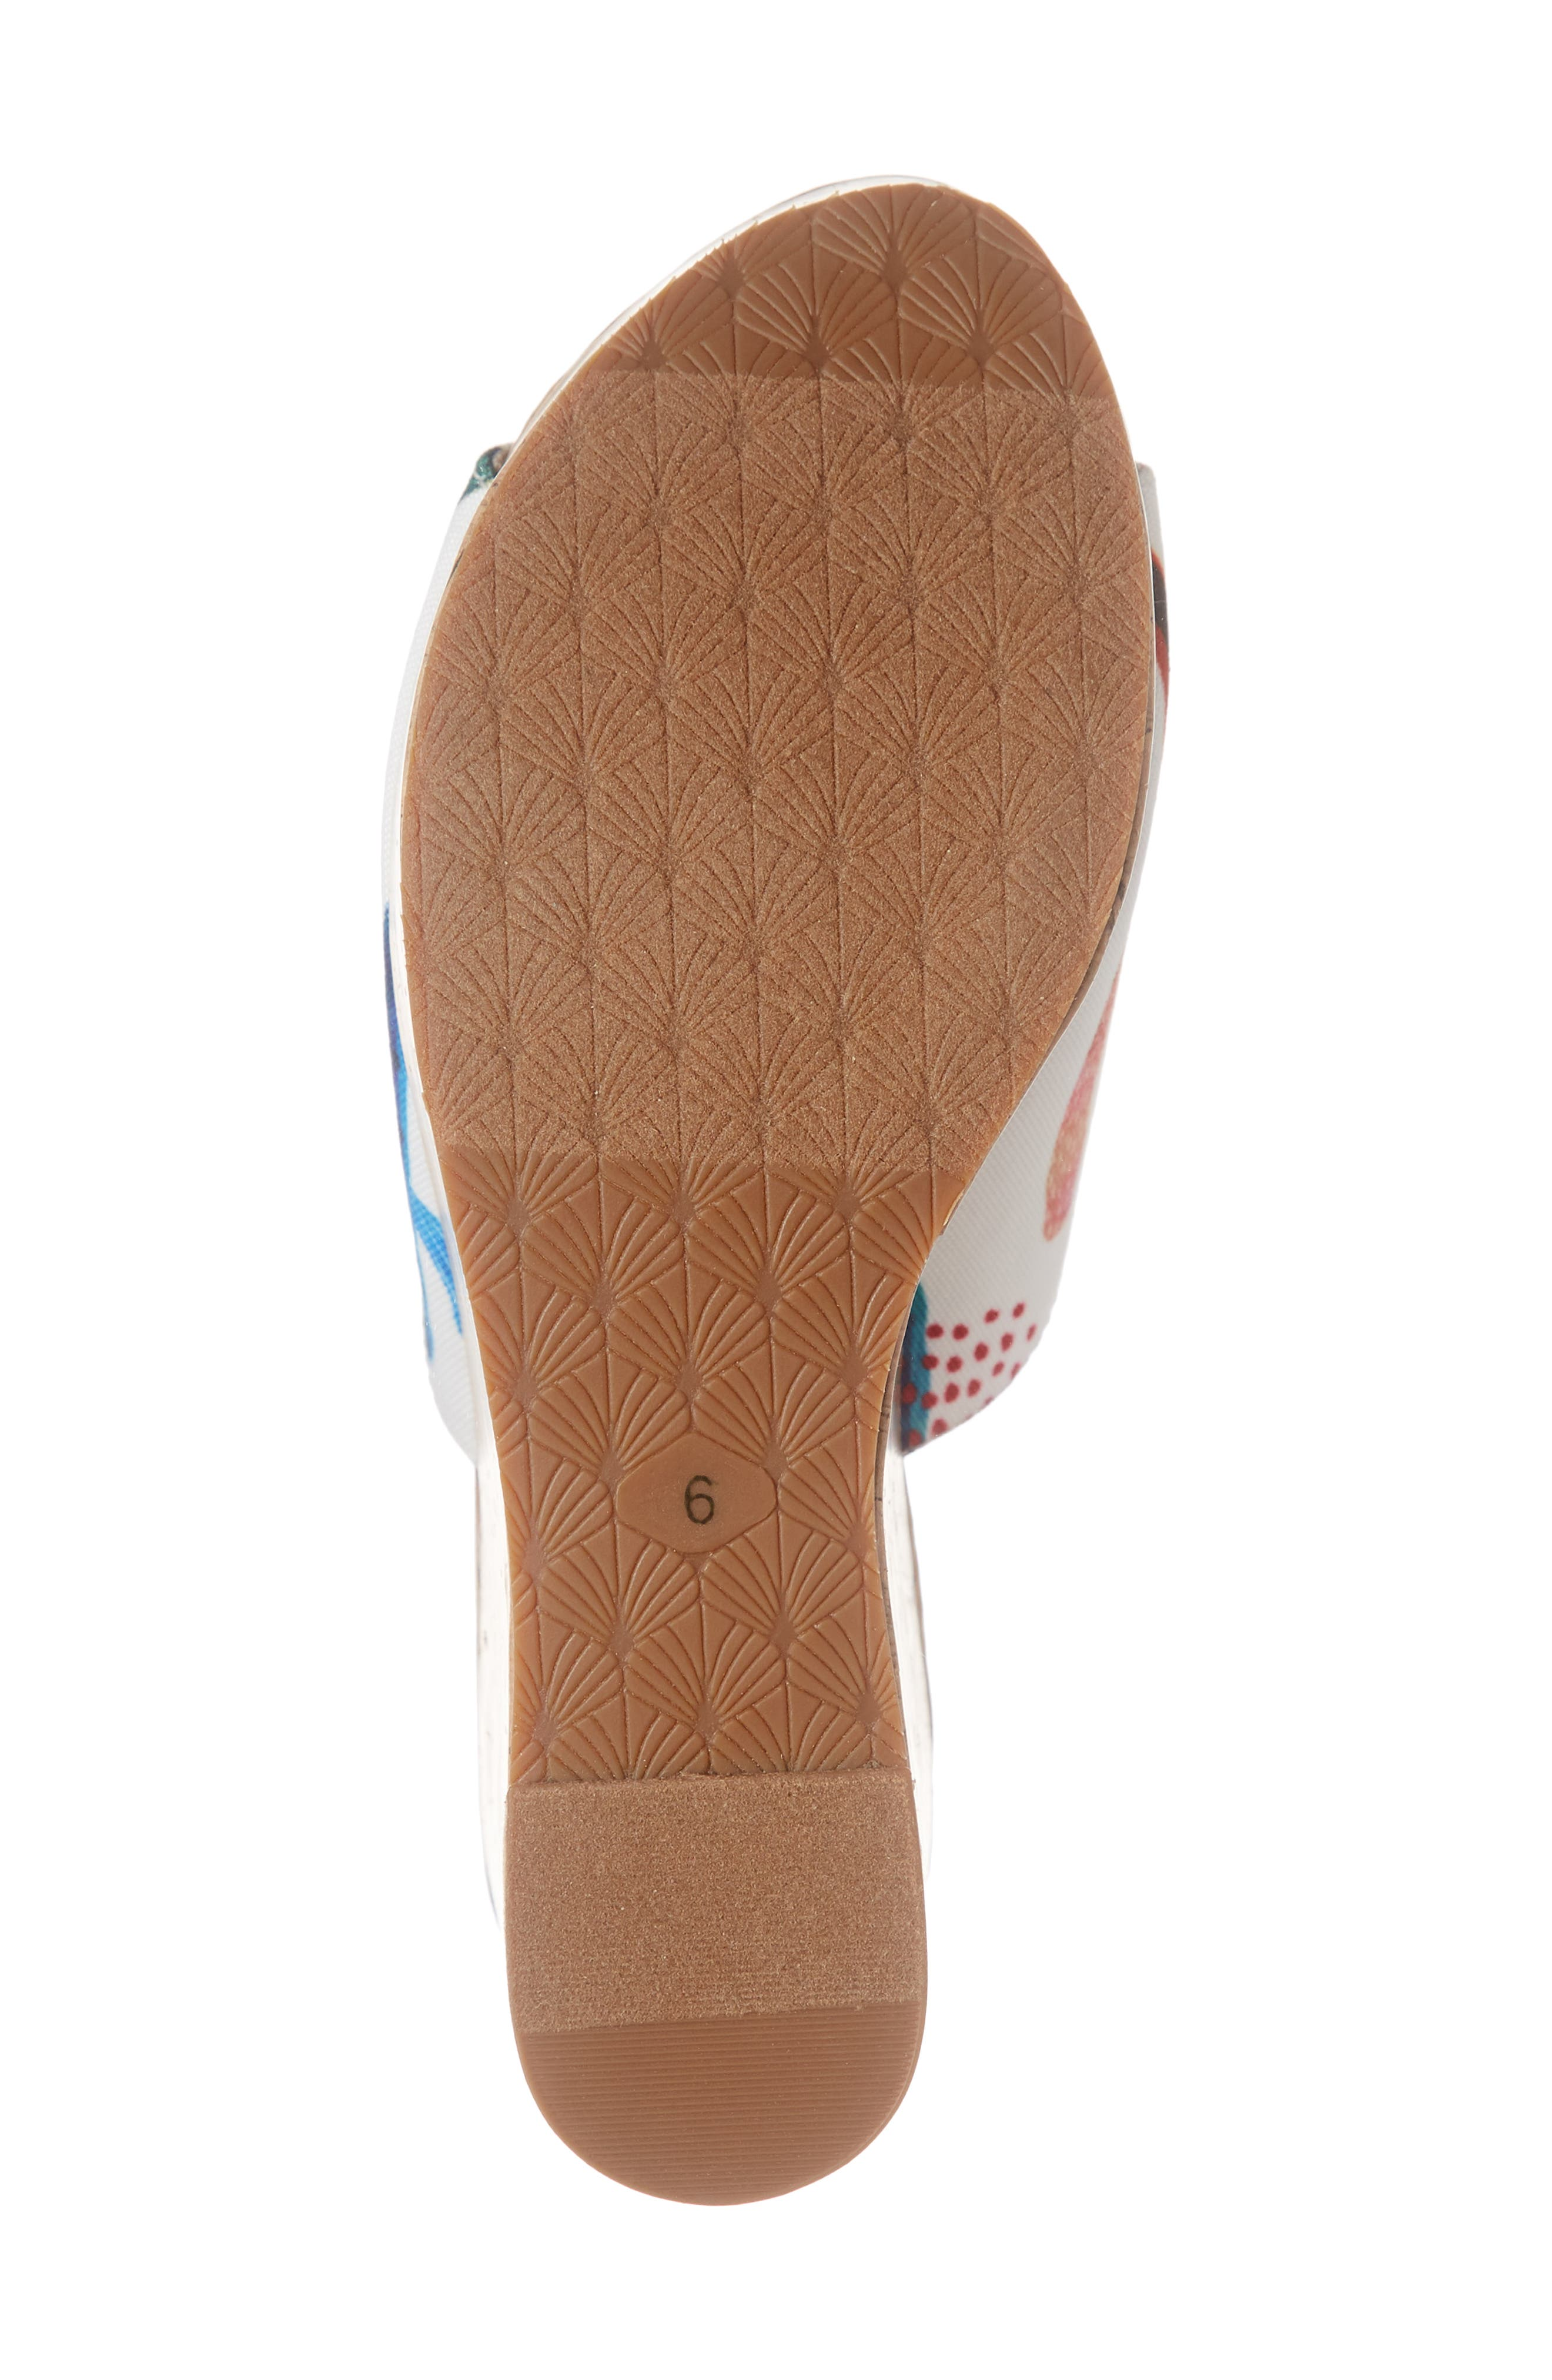 ARIAT, Layla Wedge Slide Sandal, Alternate thumbnail 6, color, CACTUS PRINT FABRIC